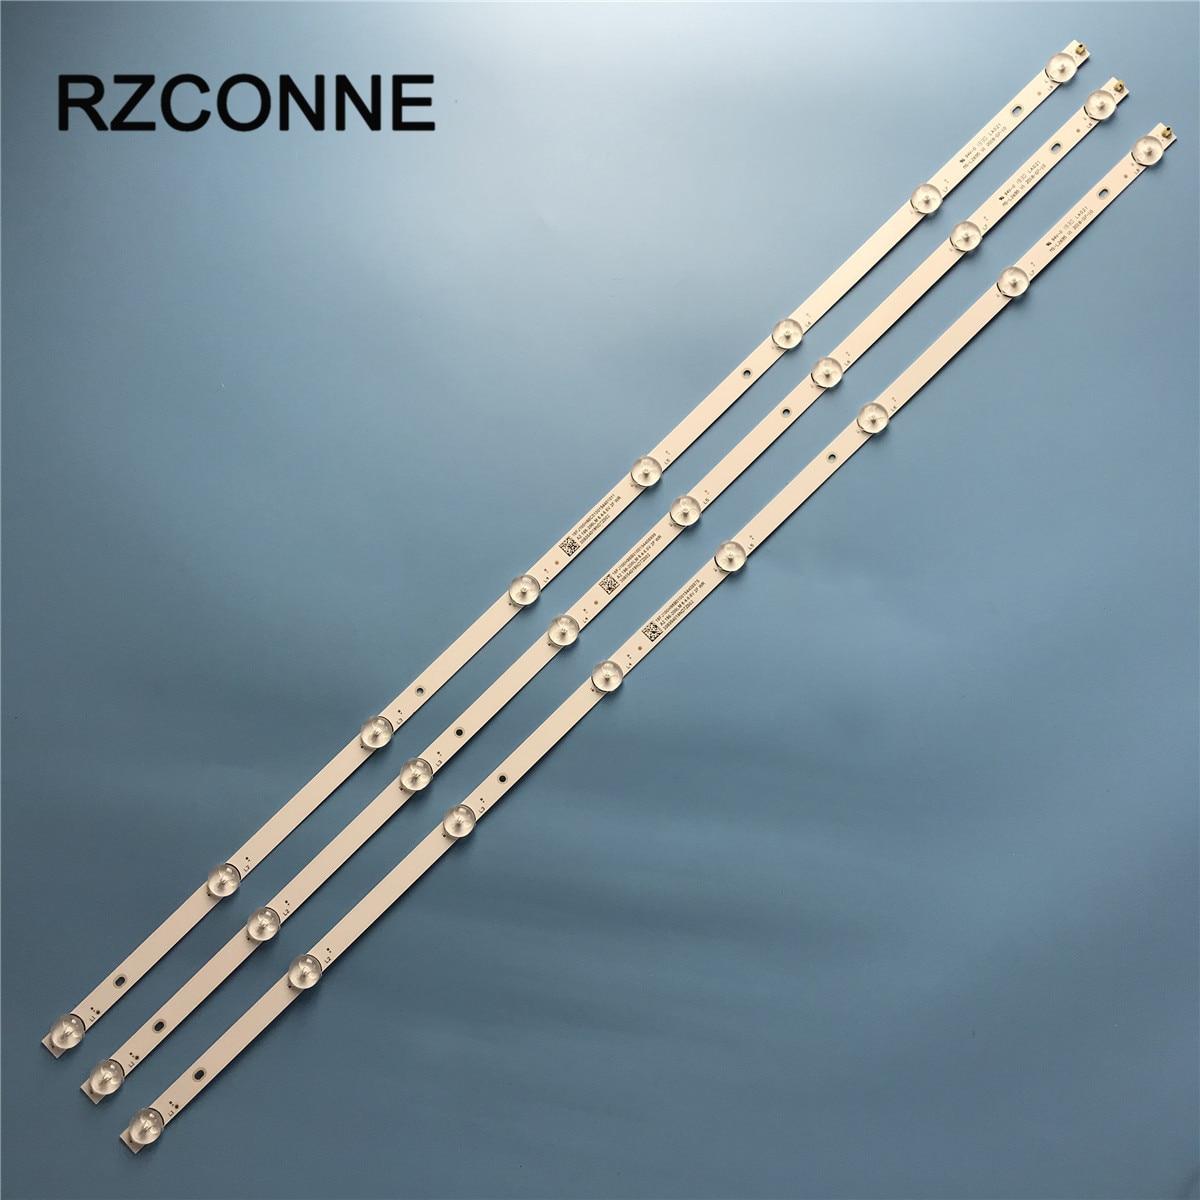 LED الخلفية قطاع 8 مصابيح MS-L2695 V1 Rca Rtv4019sm 6V/LED 750 مللي متر